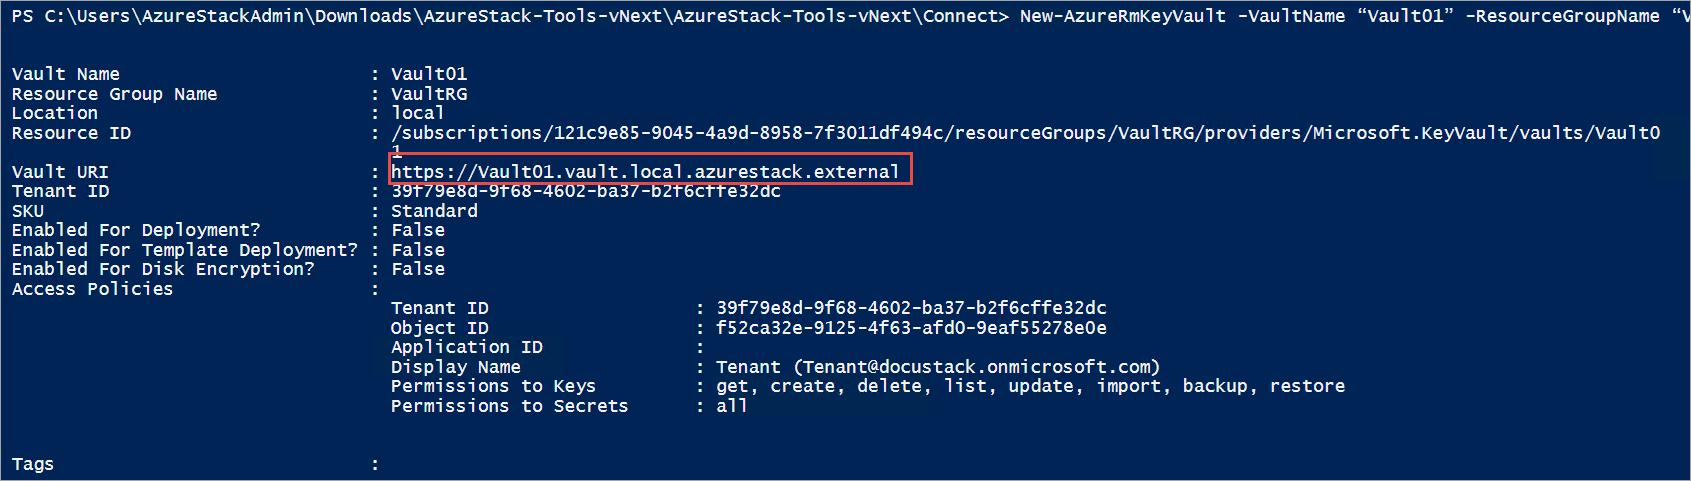 Manage Key Vault in Azure Stack using PowerShell | Microsoft